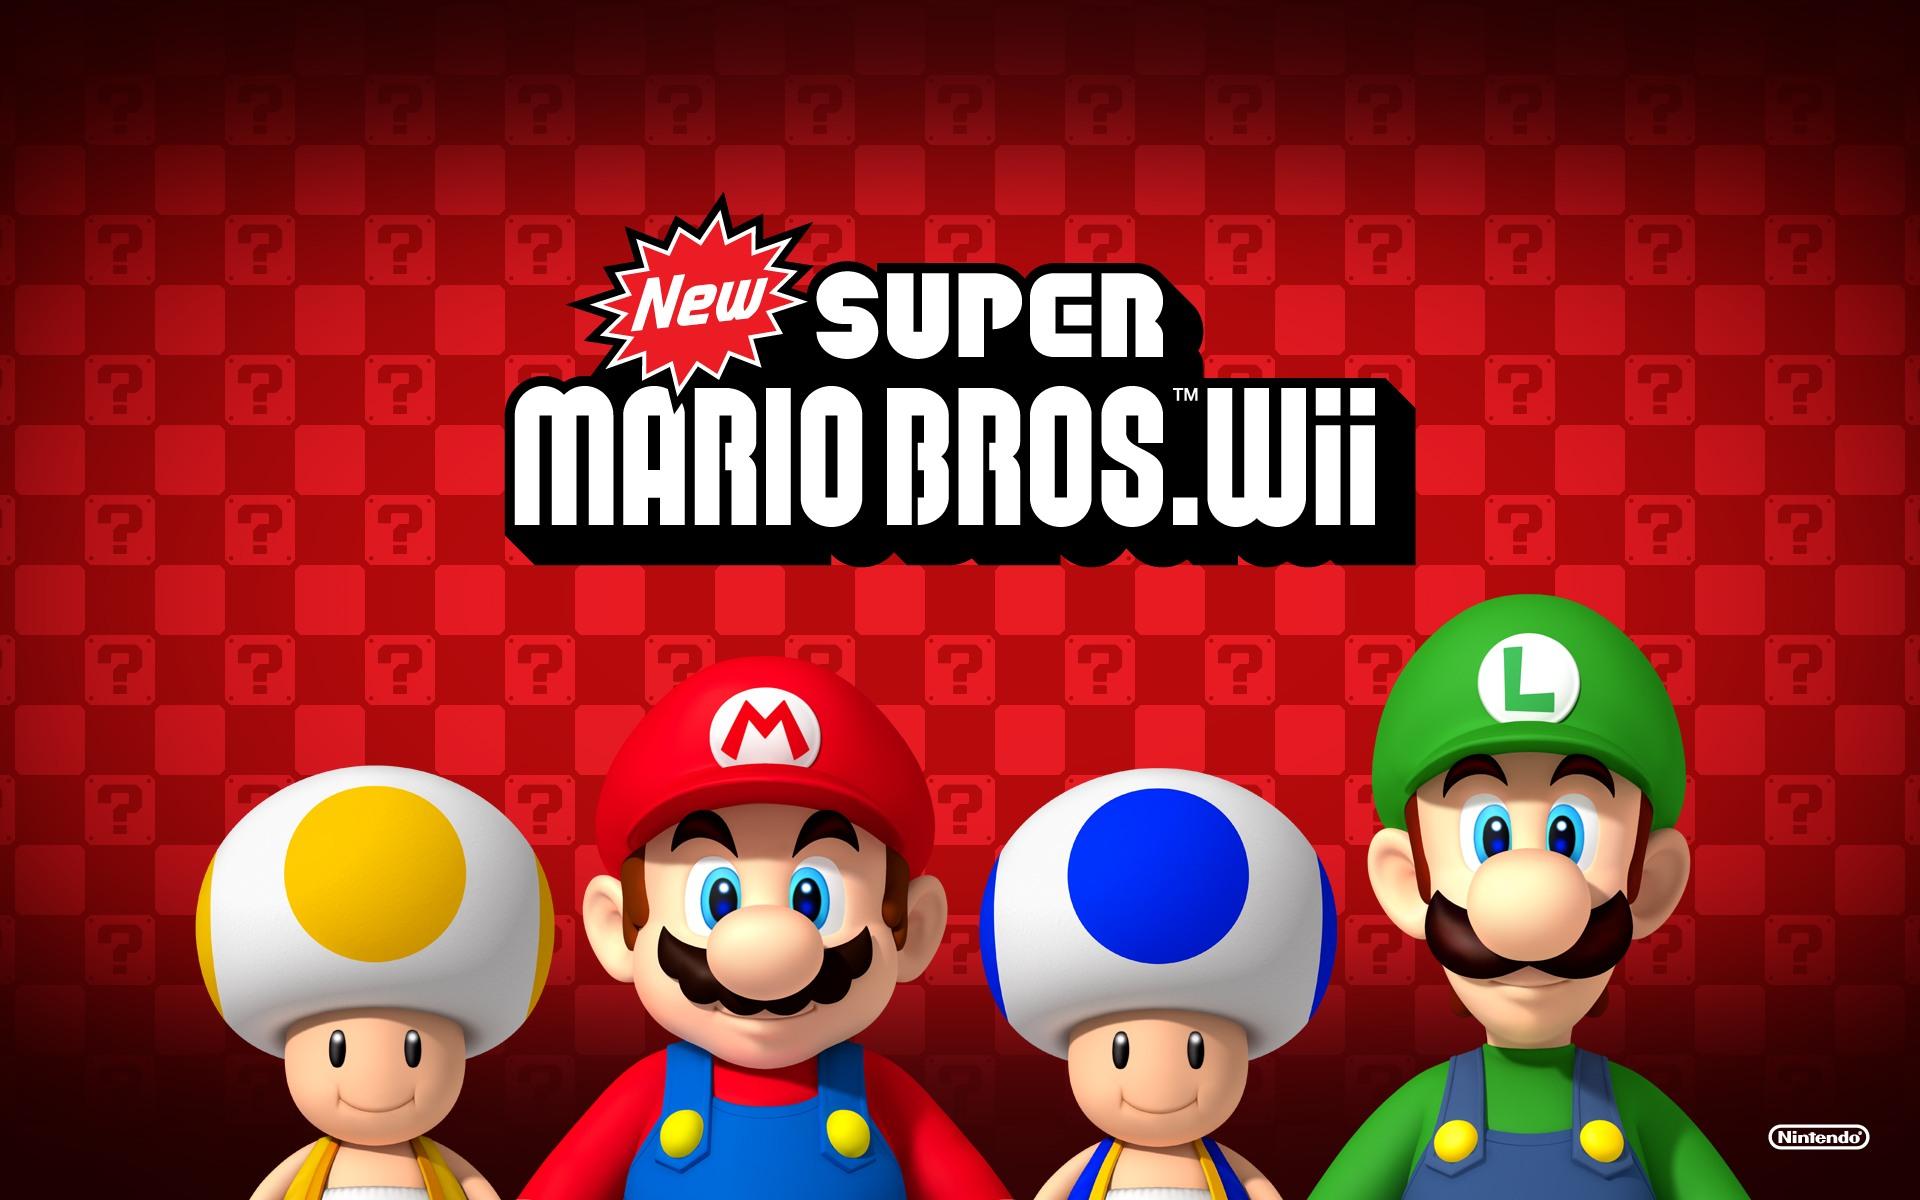 ws_New_Super_Mario_Bros._Wii_1920x1200